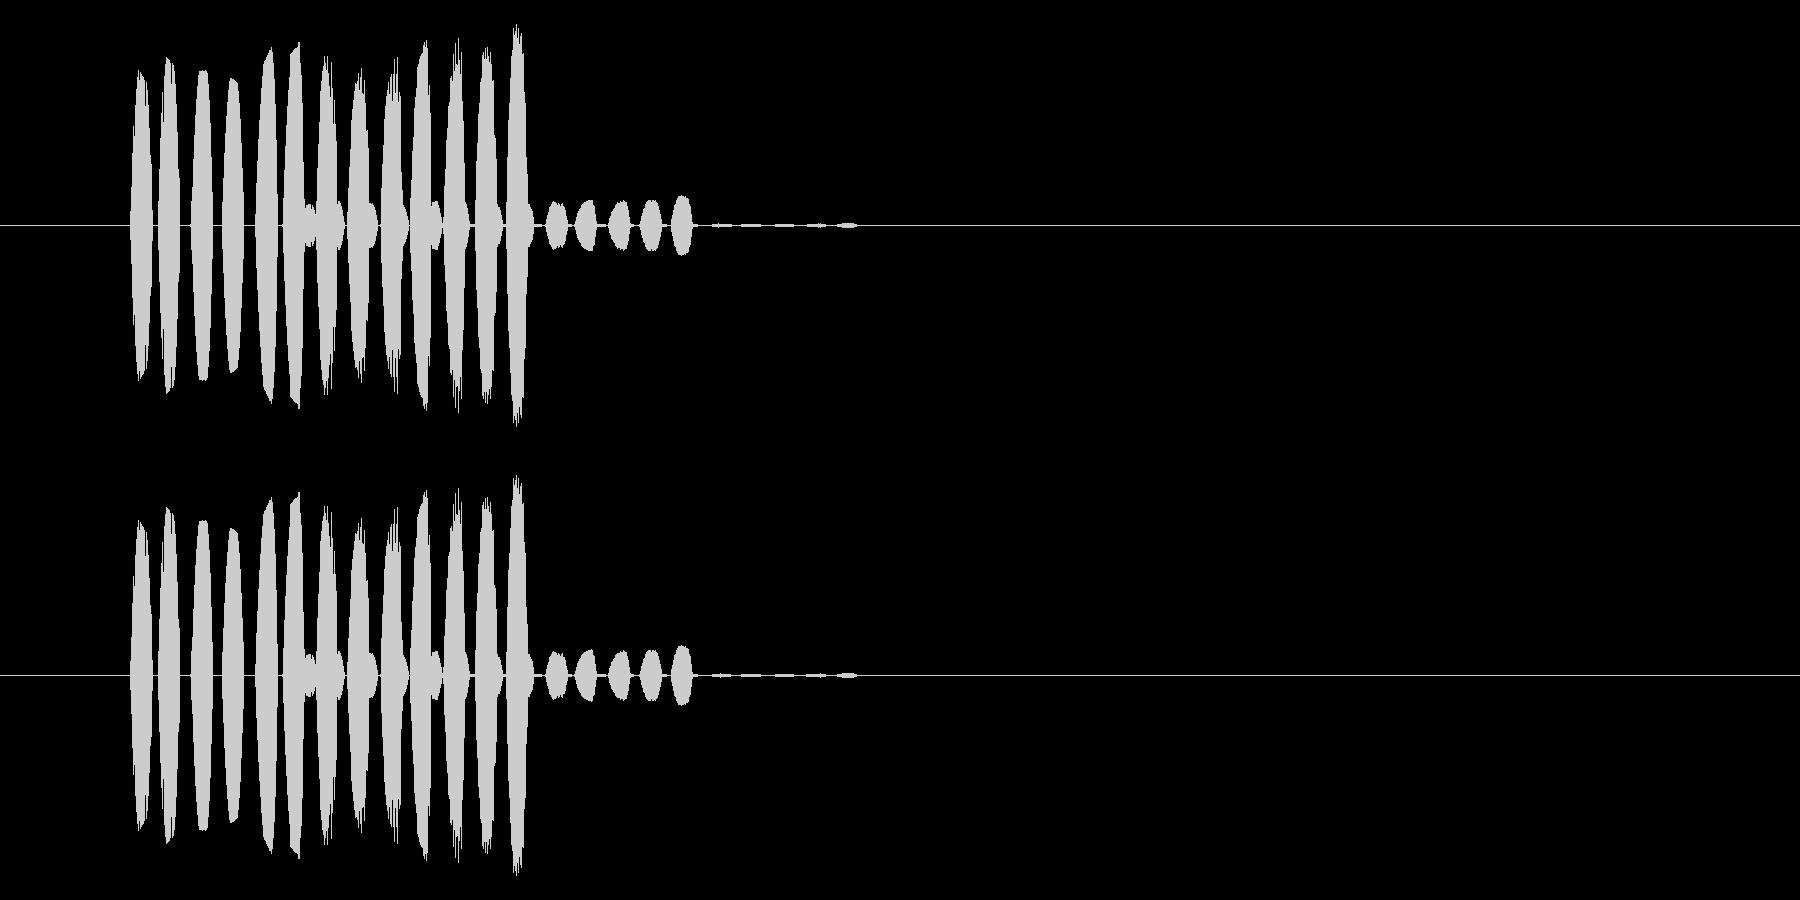 SNES-RPG04-15(魔法 状態)の未再生の波形